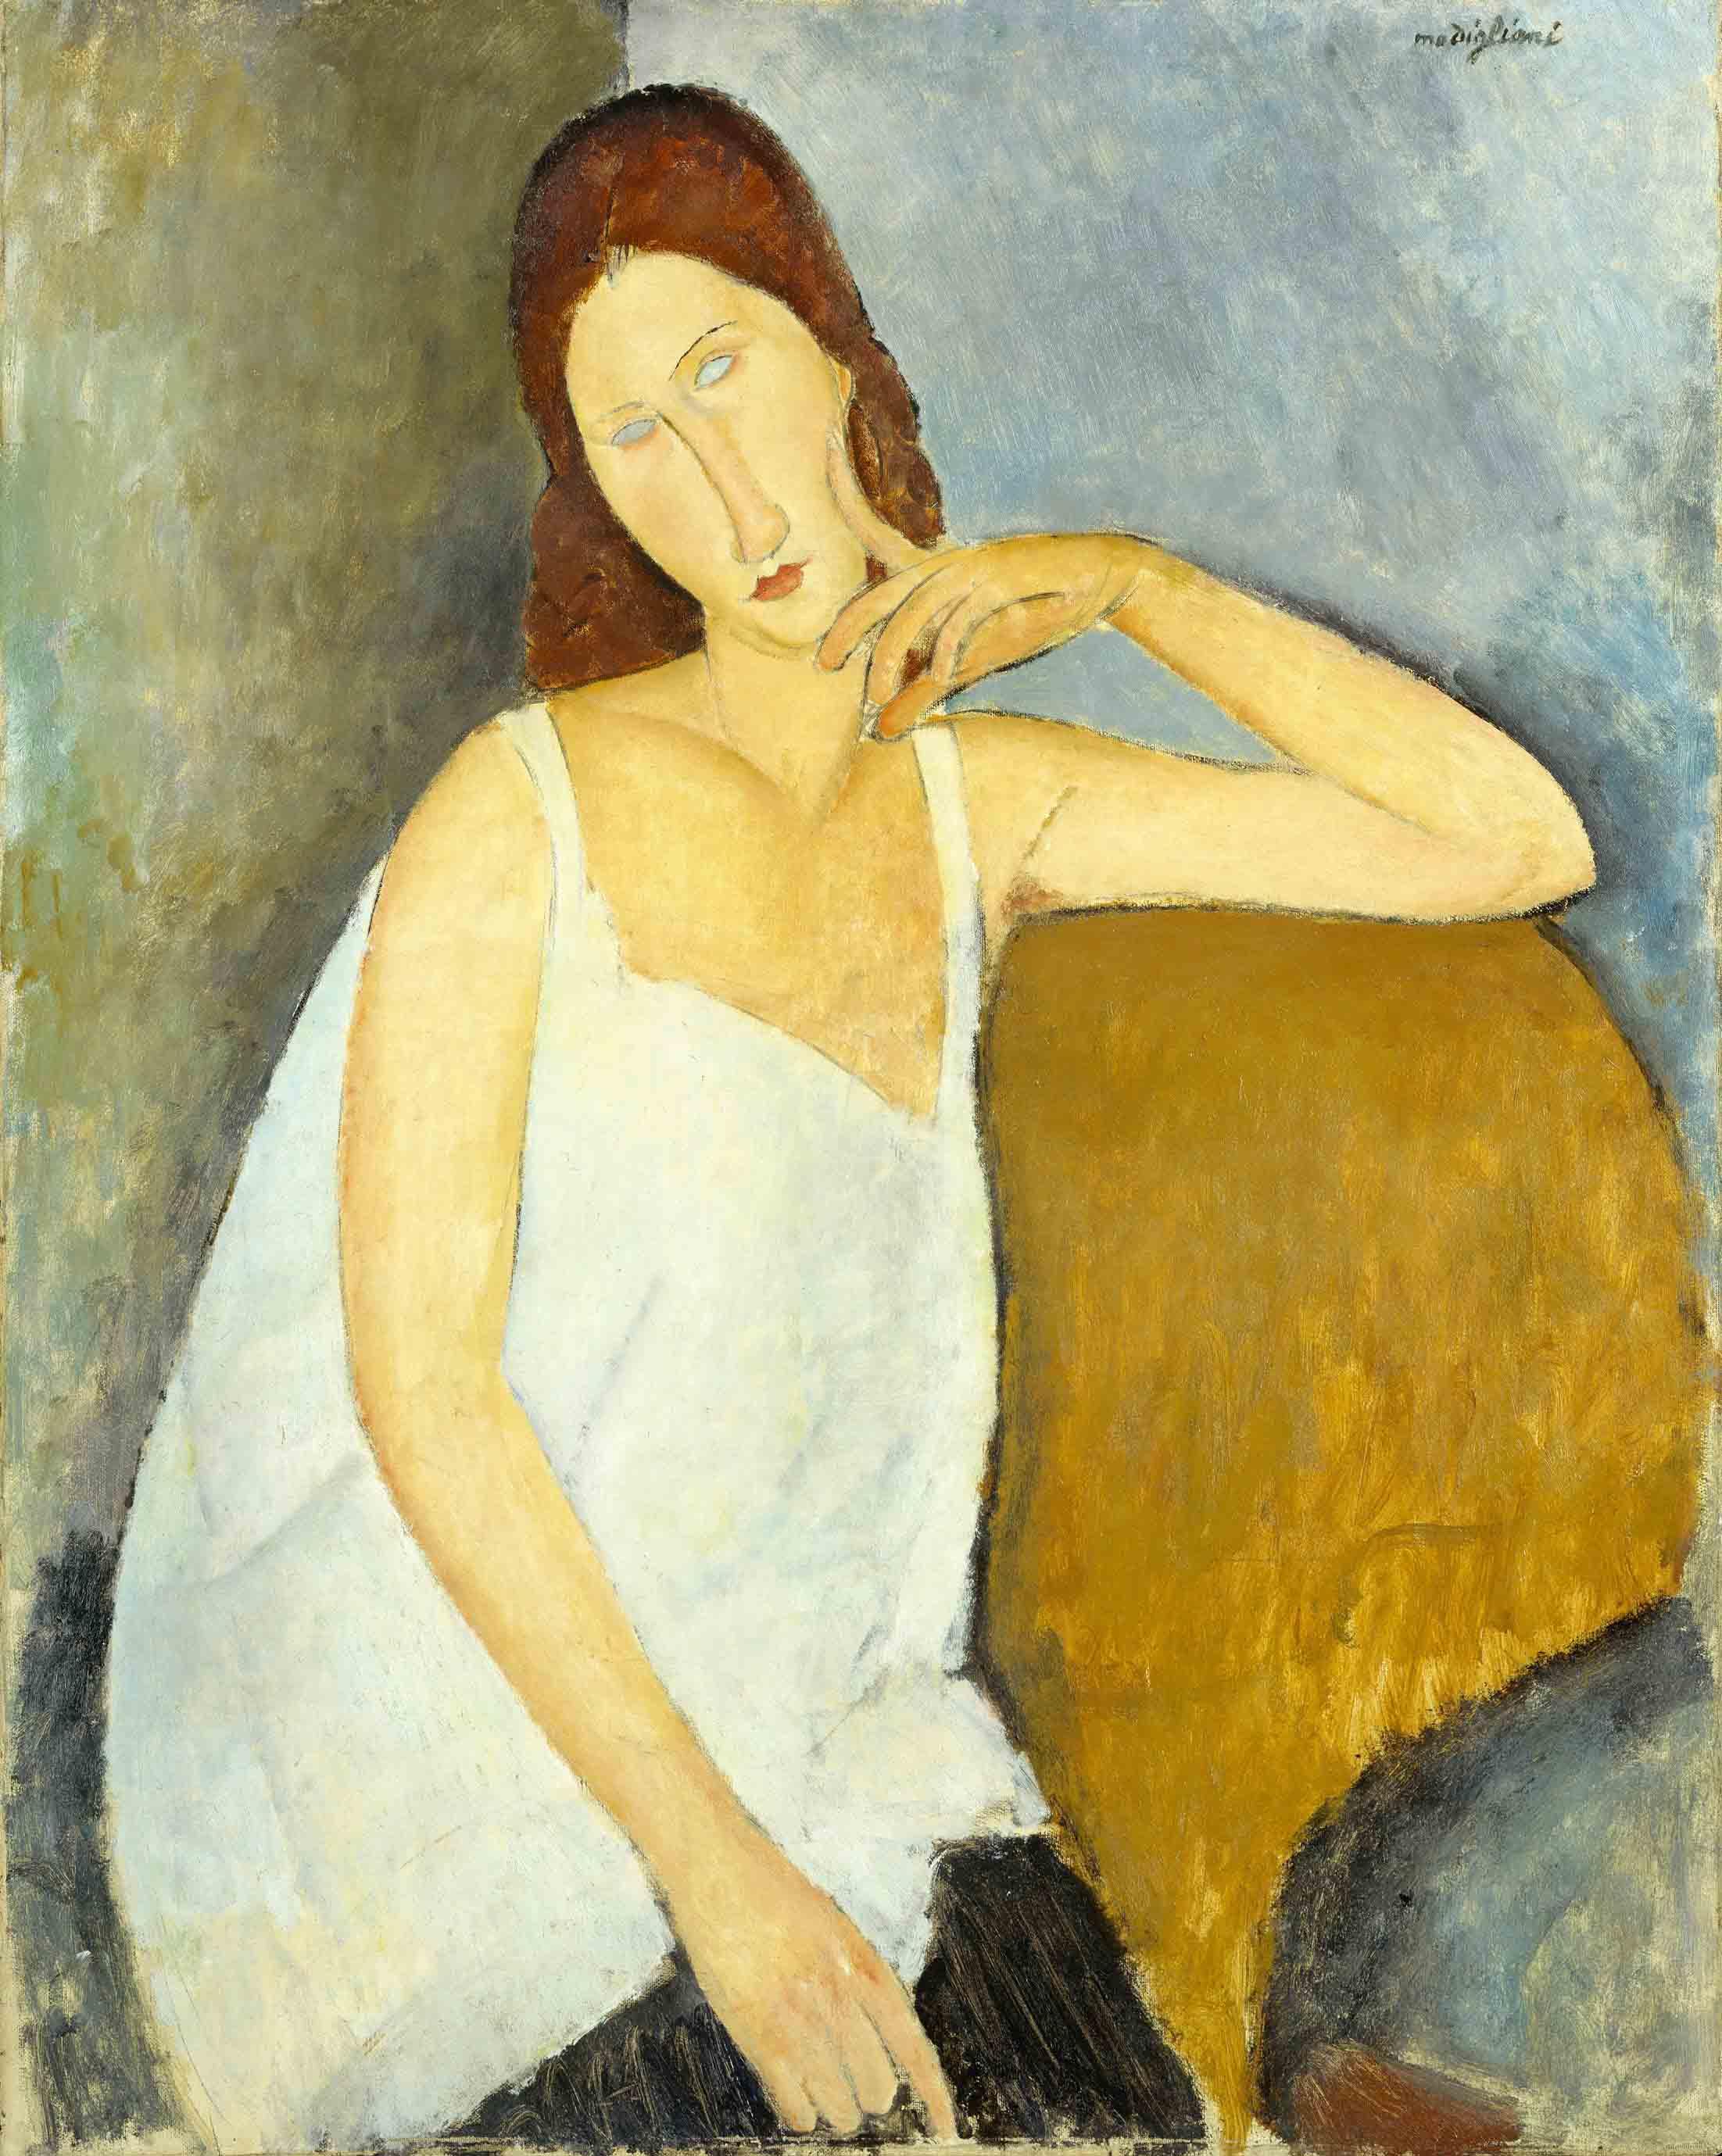 Amedeo Modigliani 1884 - 1920 Jeanne Hébuterne 1919 Medium Oil paint on canvas 914 x 730 mm The Metropolitan Museum of Art, New York